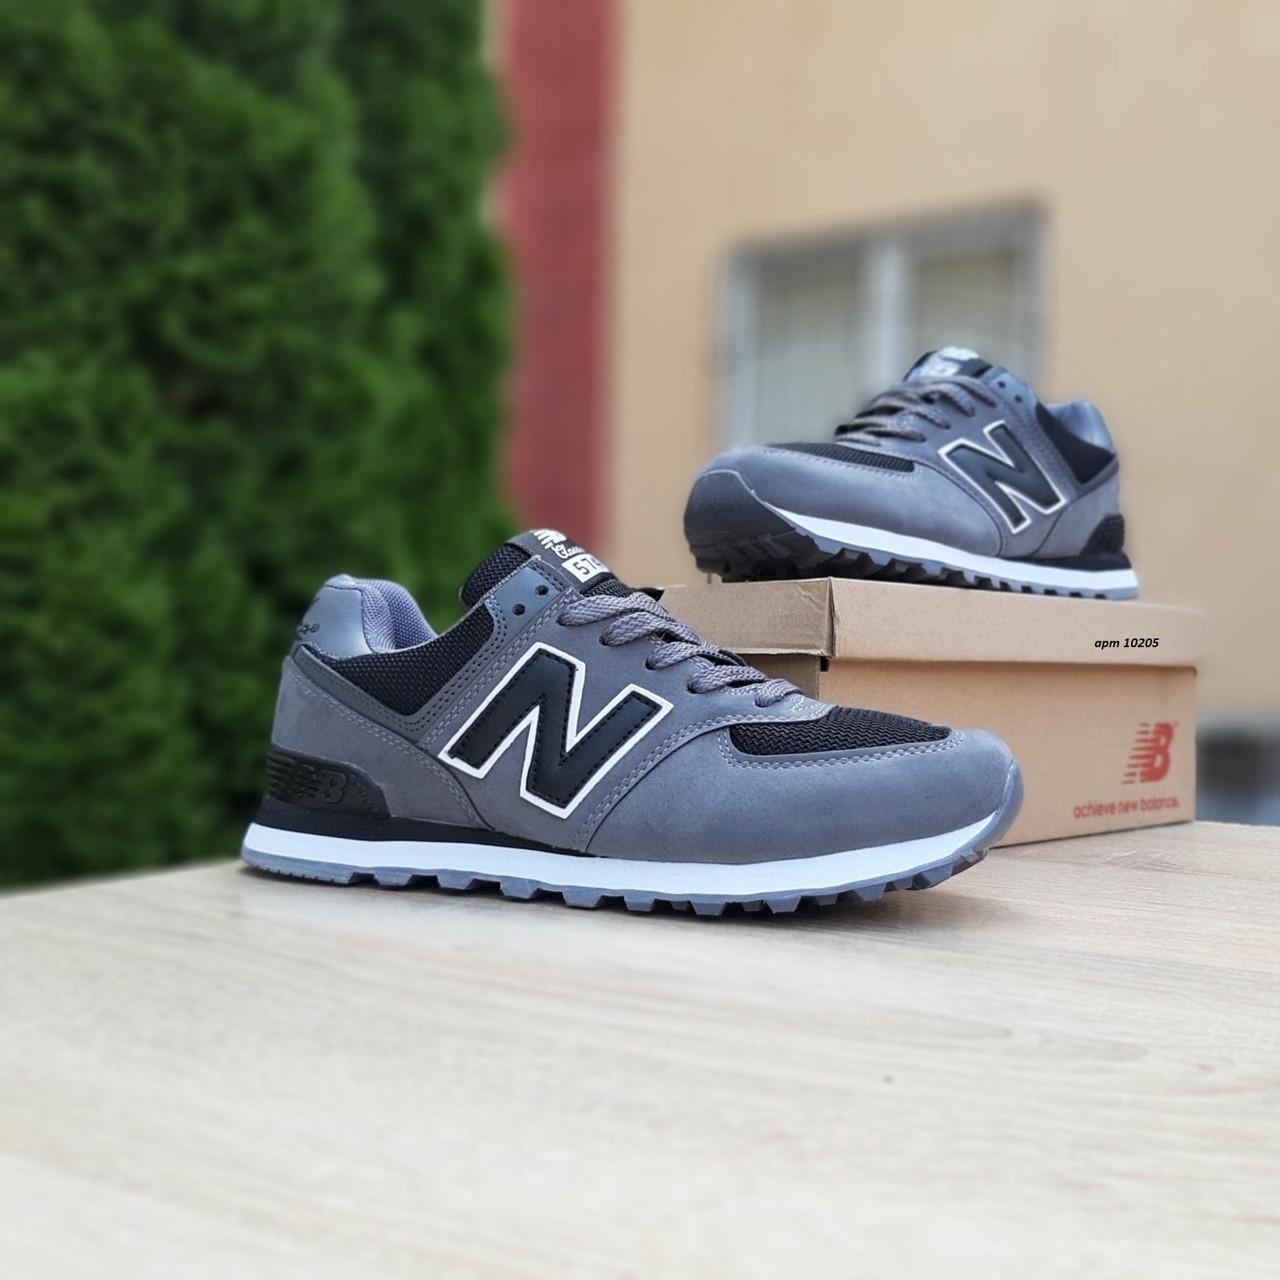 Мужские кроссовки Nеw Balance 574